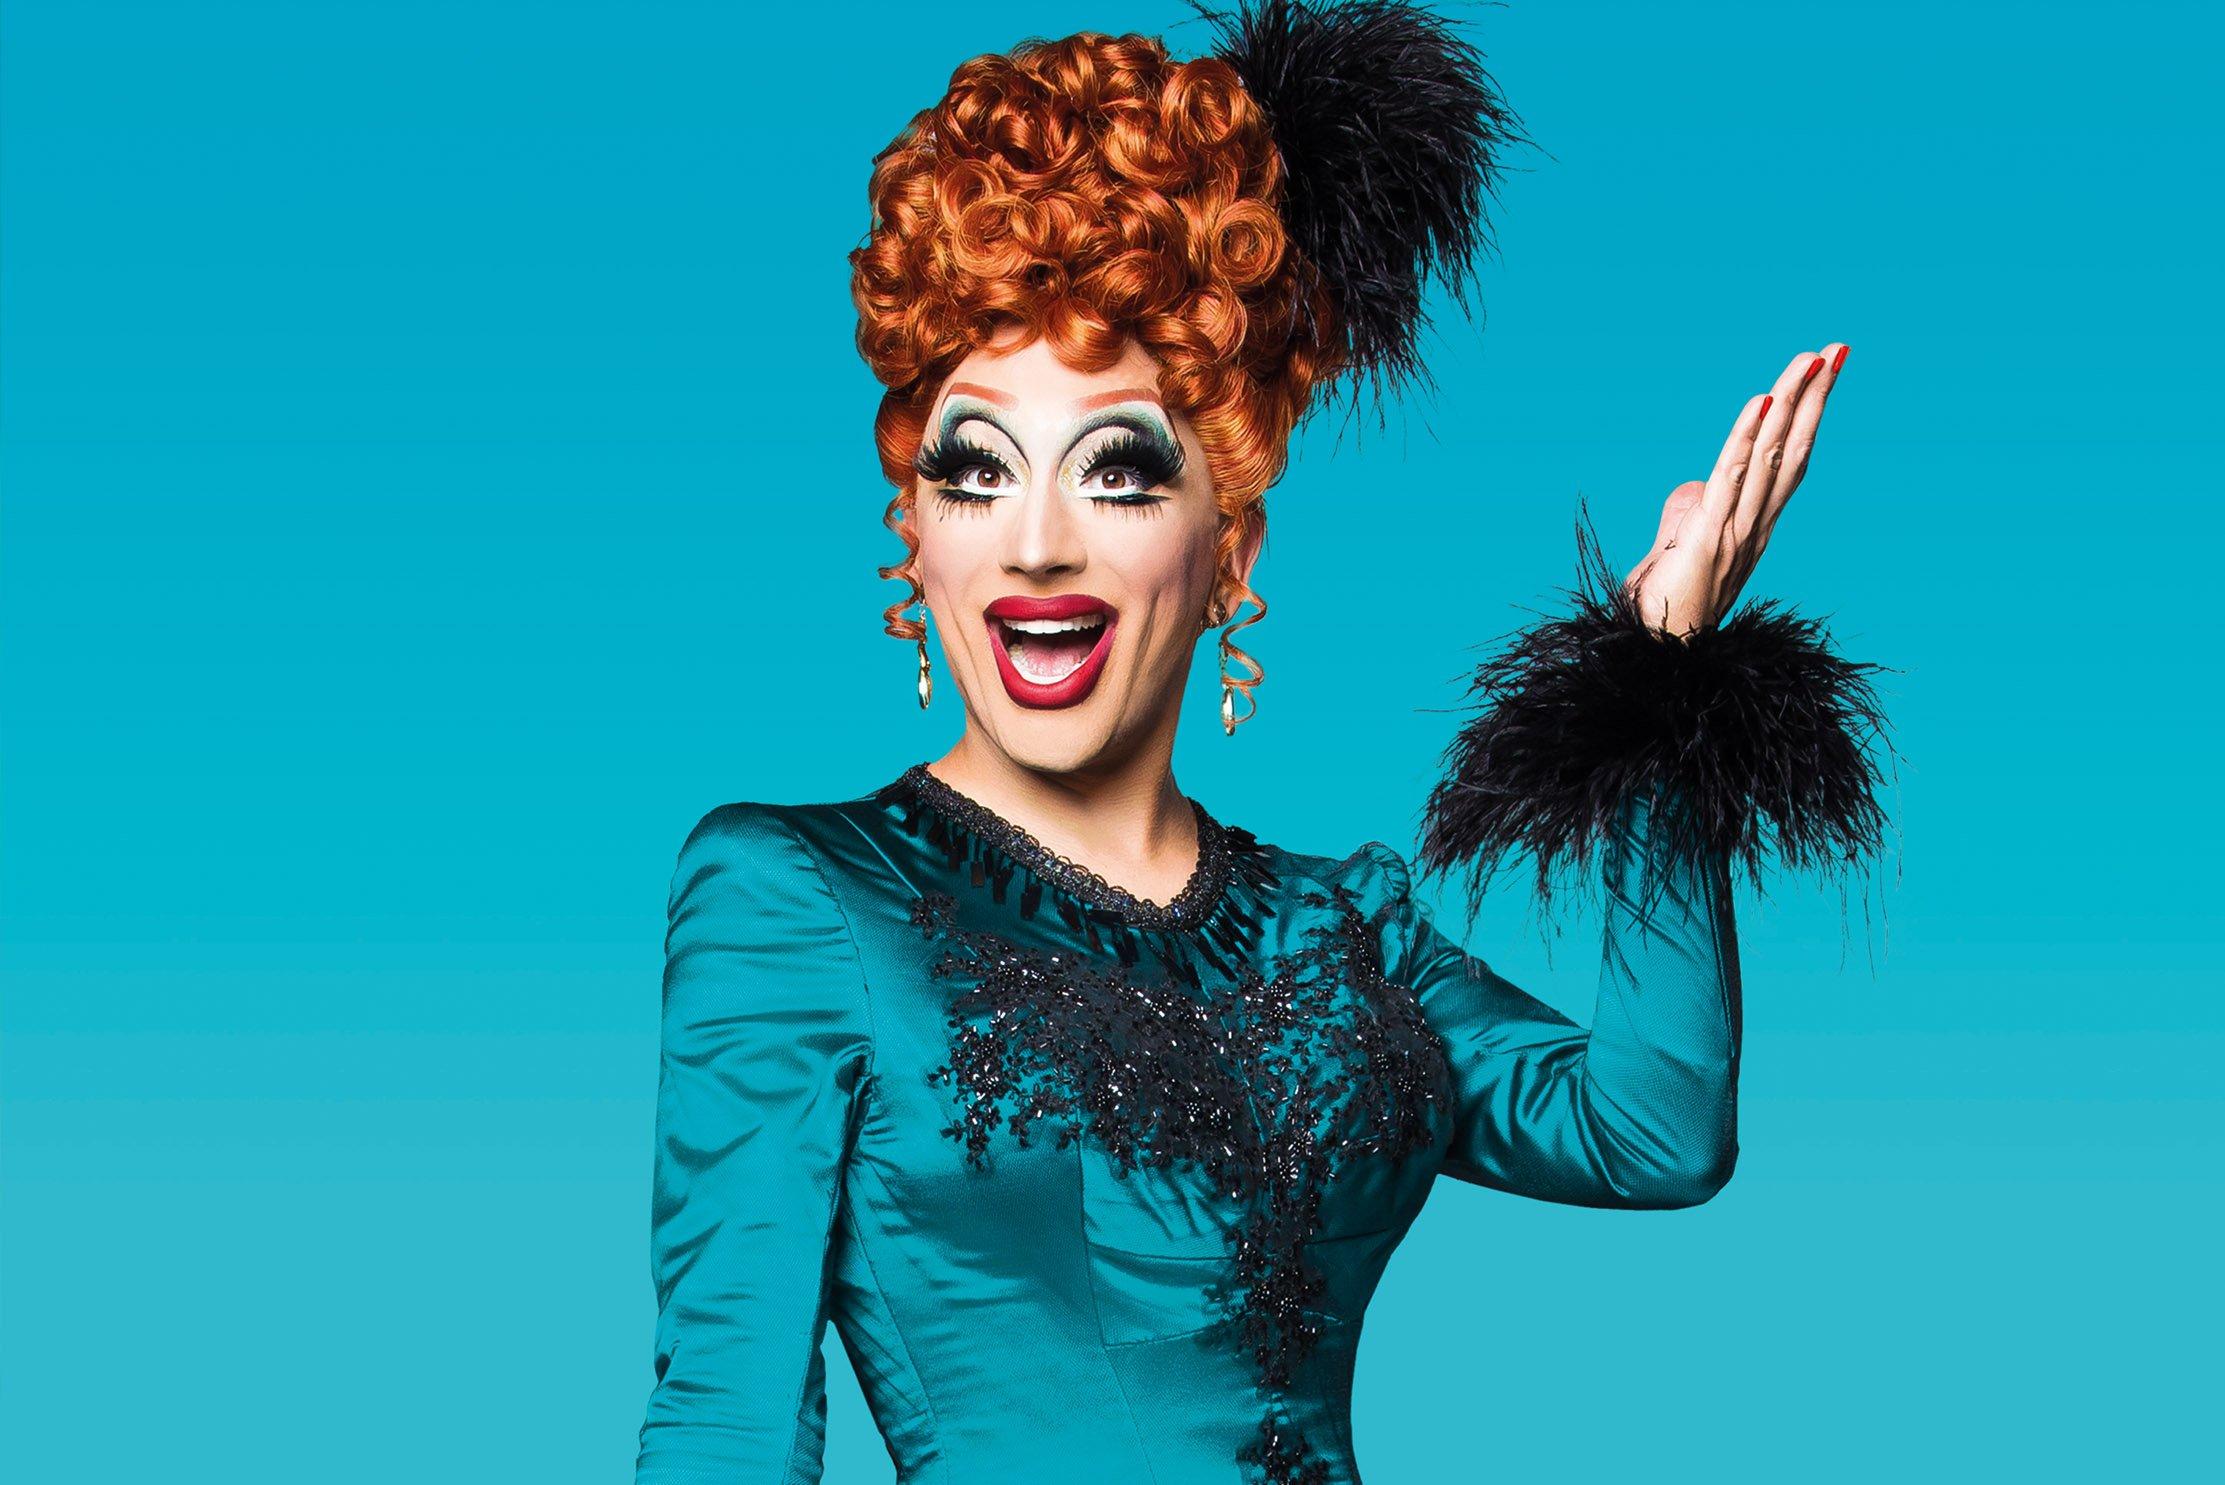 Theatre Royal Brighton has unveiled its fabulous new season for Autumn 2021